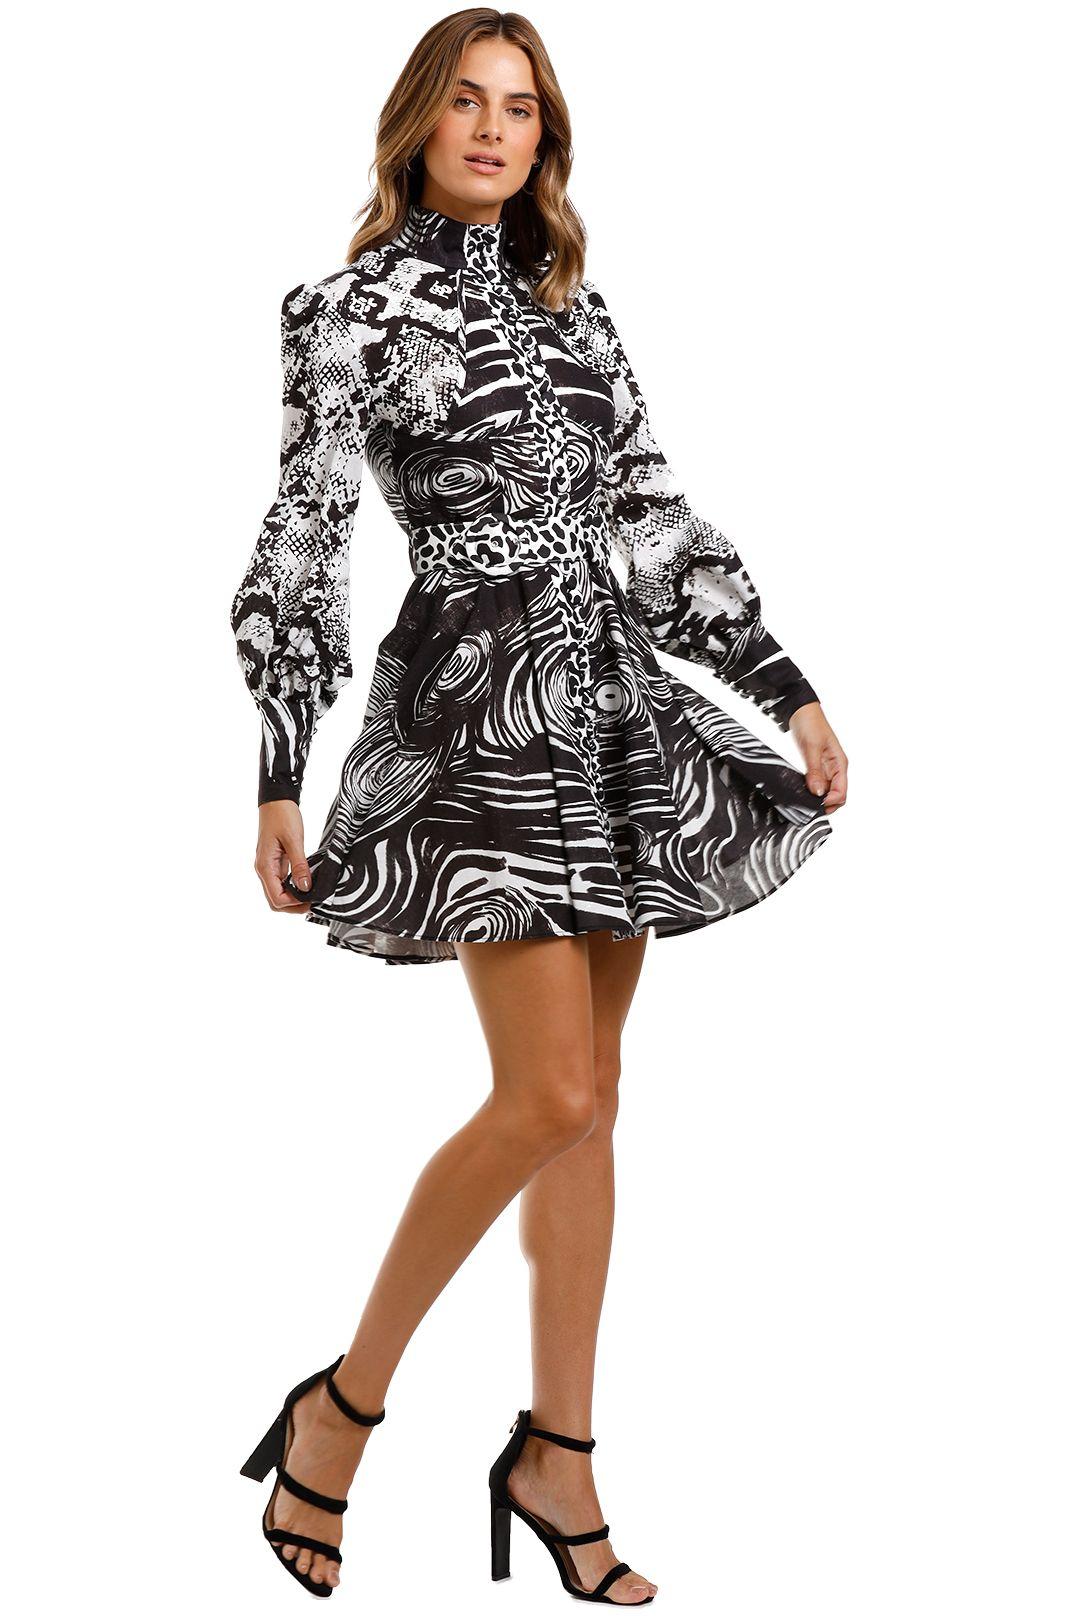 LEO & LIN Animalia Night Short Dress Black High Neck